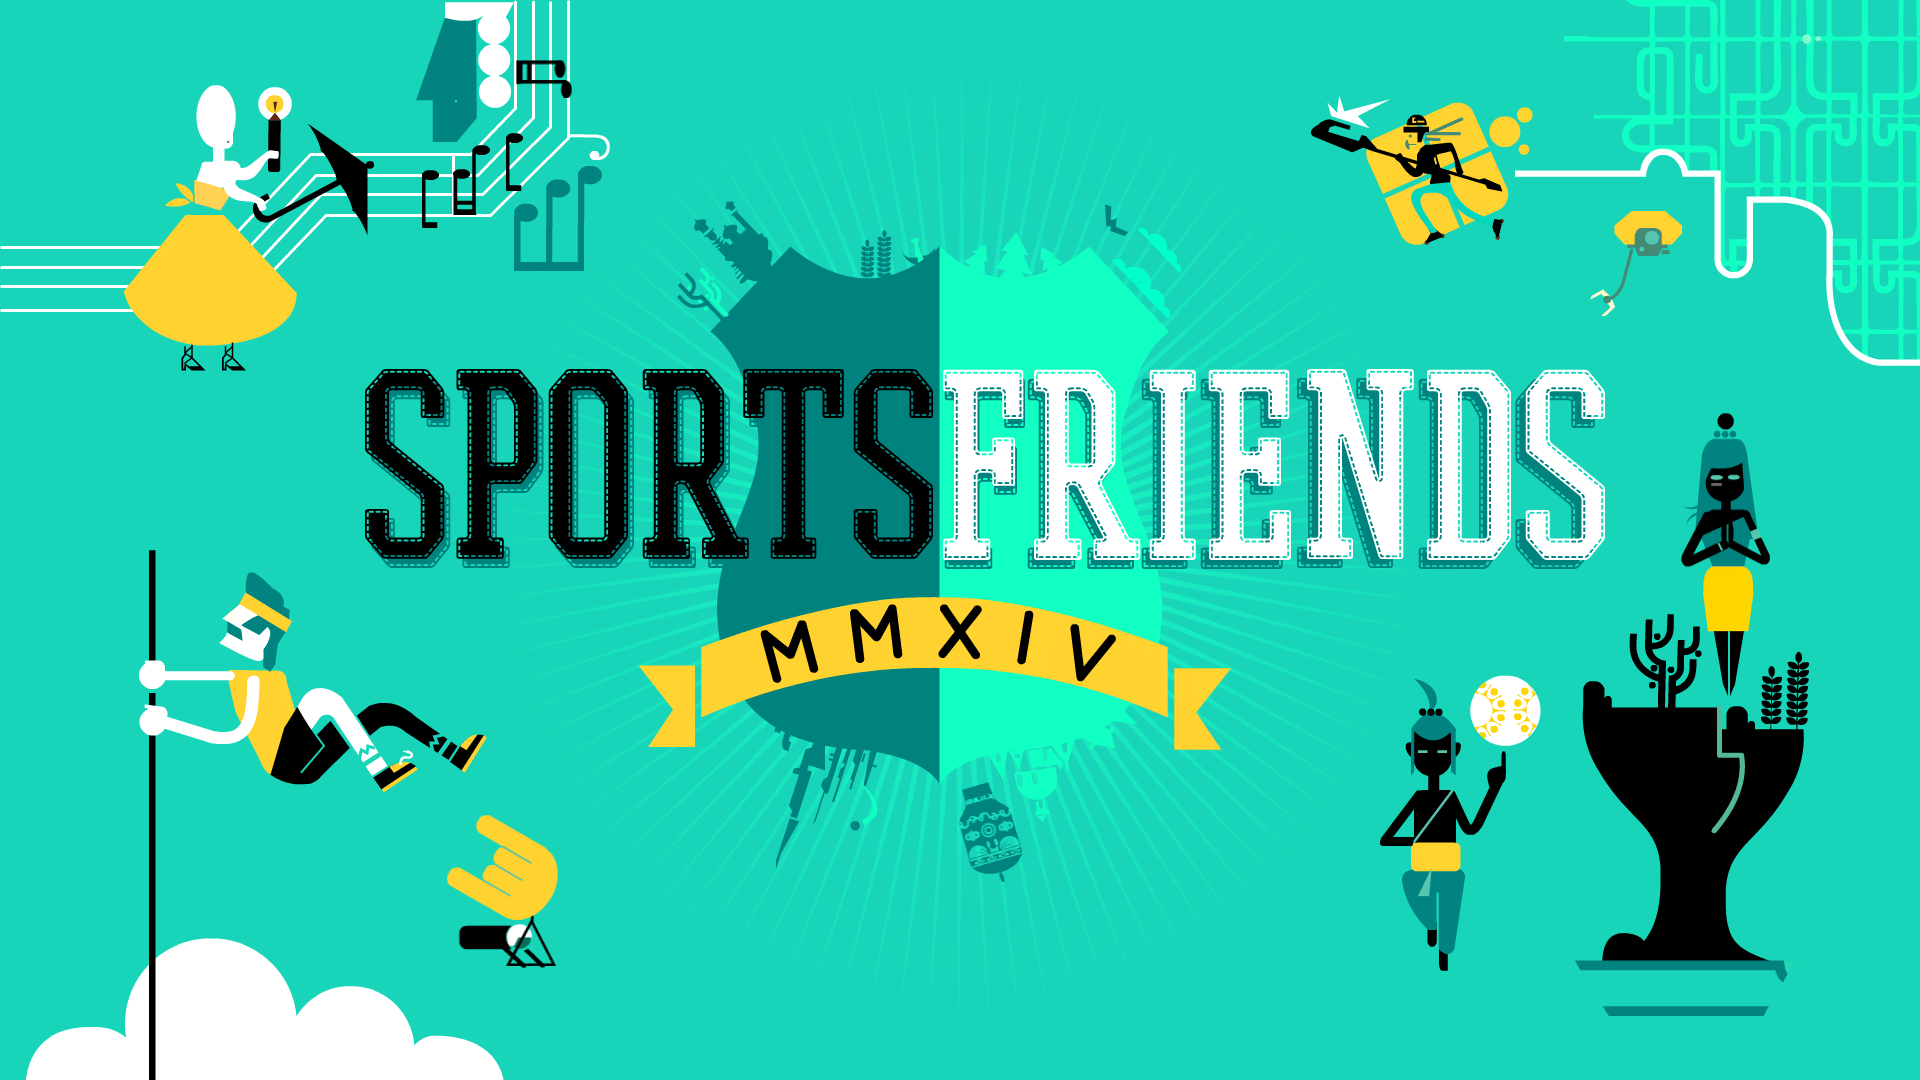 buy Sportsfriends cd key for pc platform